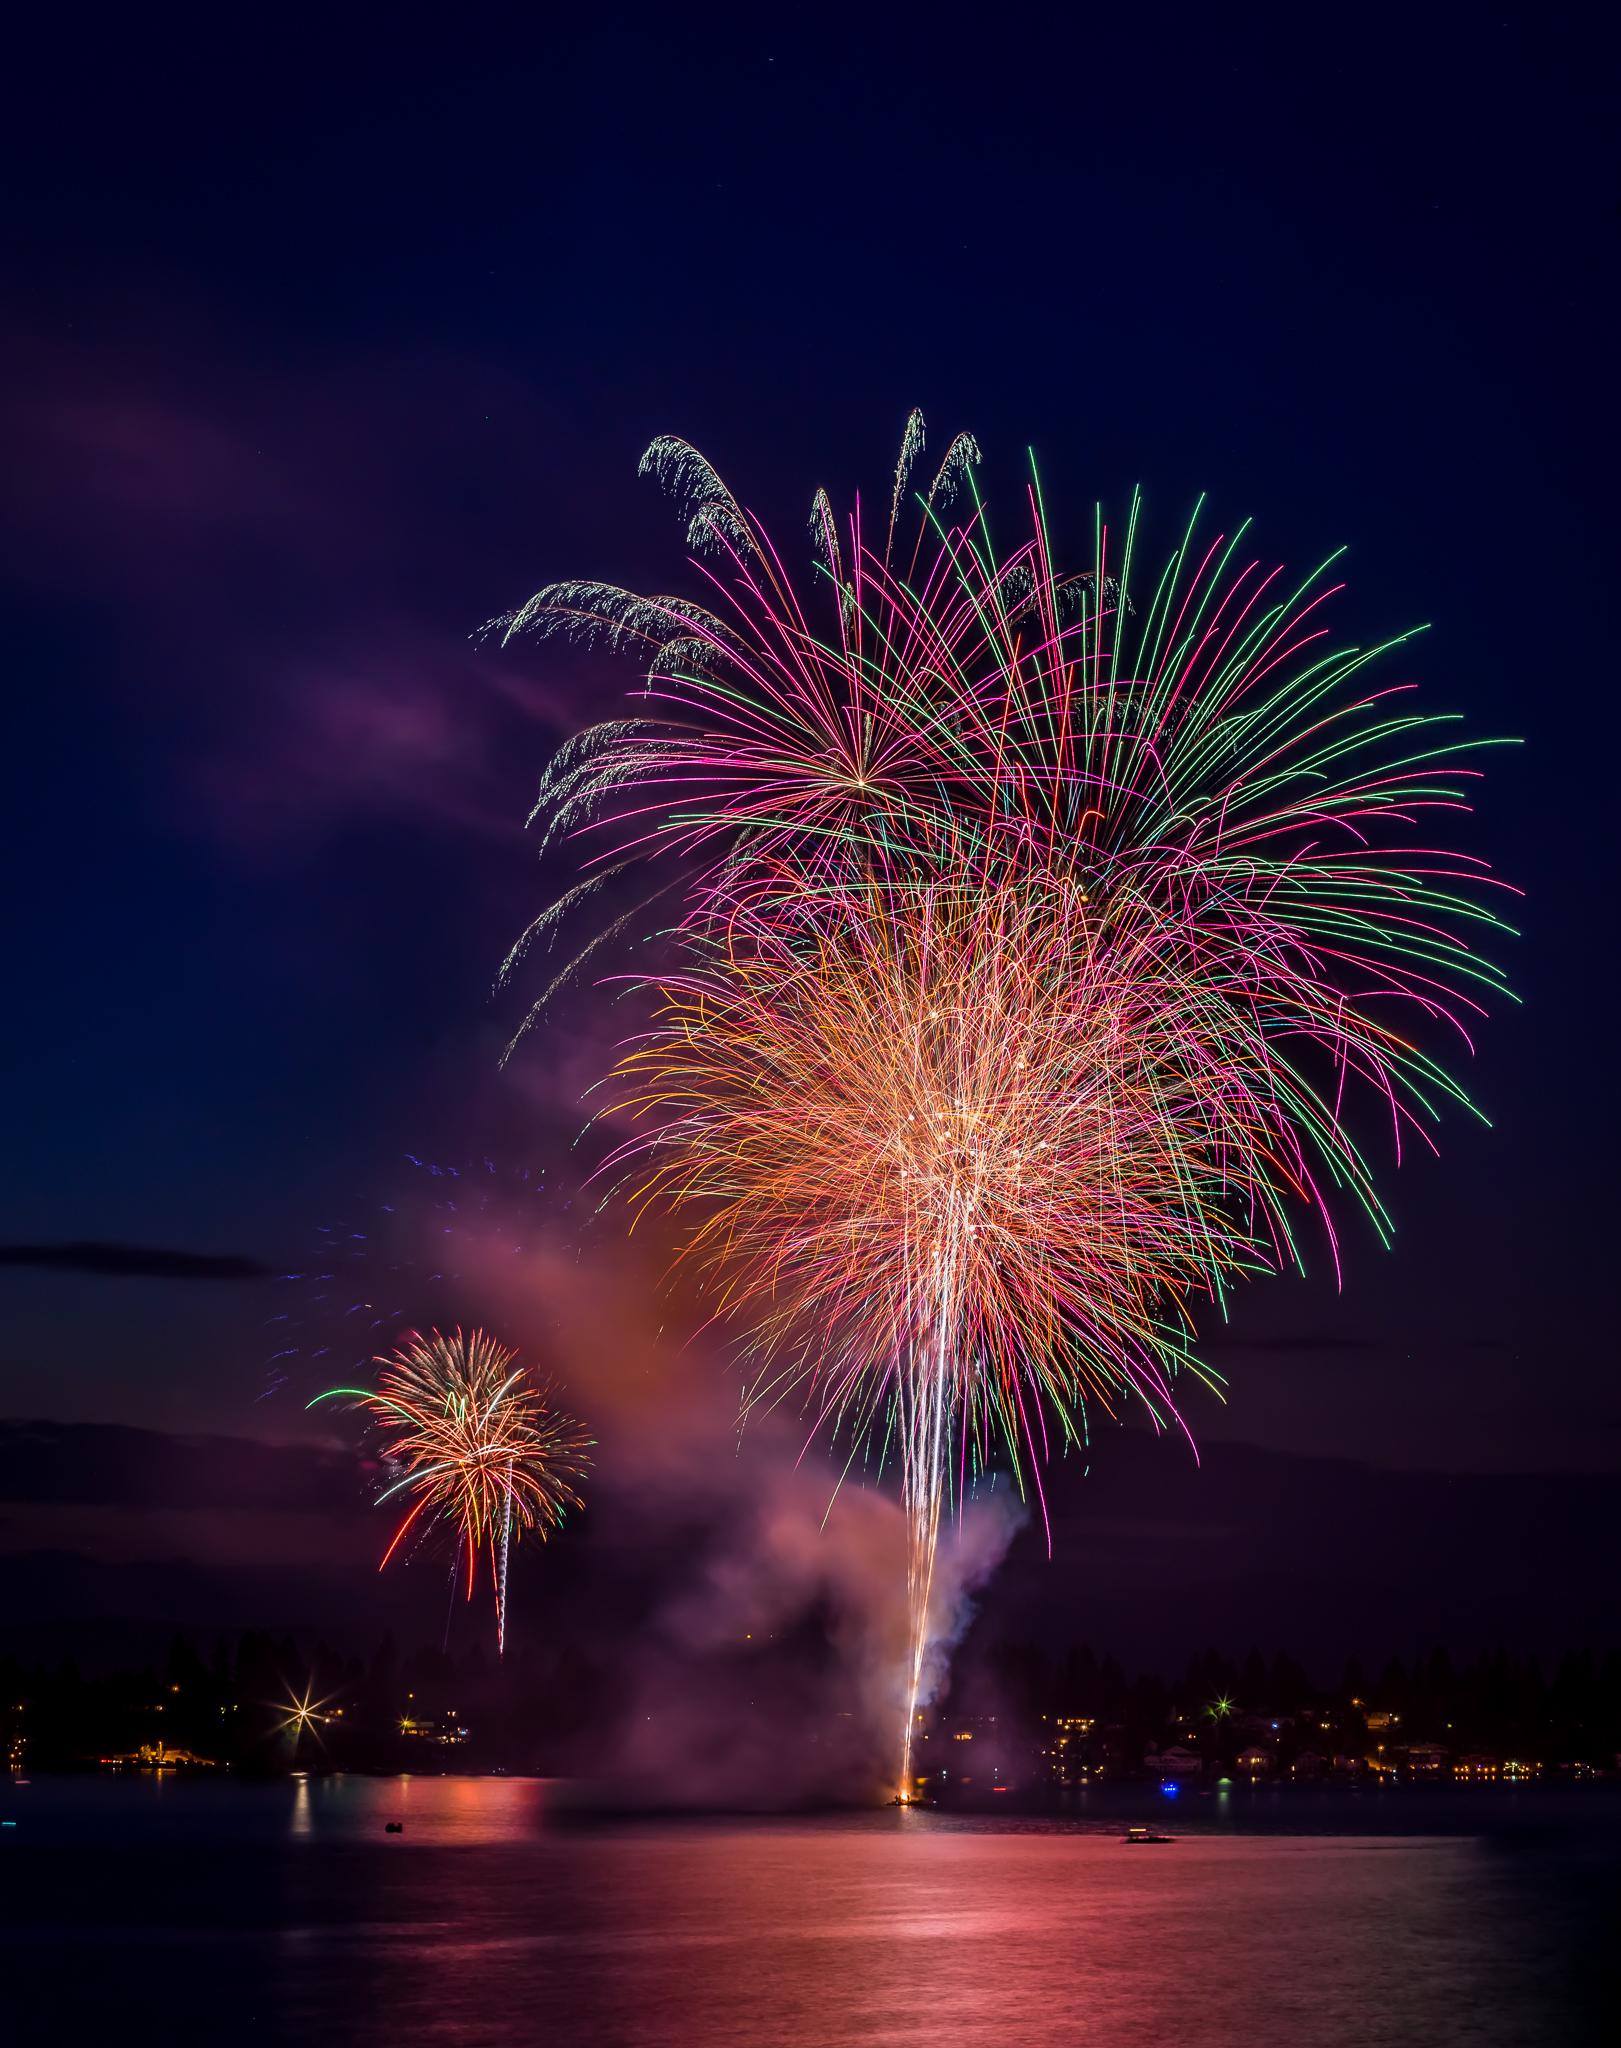 Fireworks over Liberty Lake, Washington July 4th, 2015